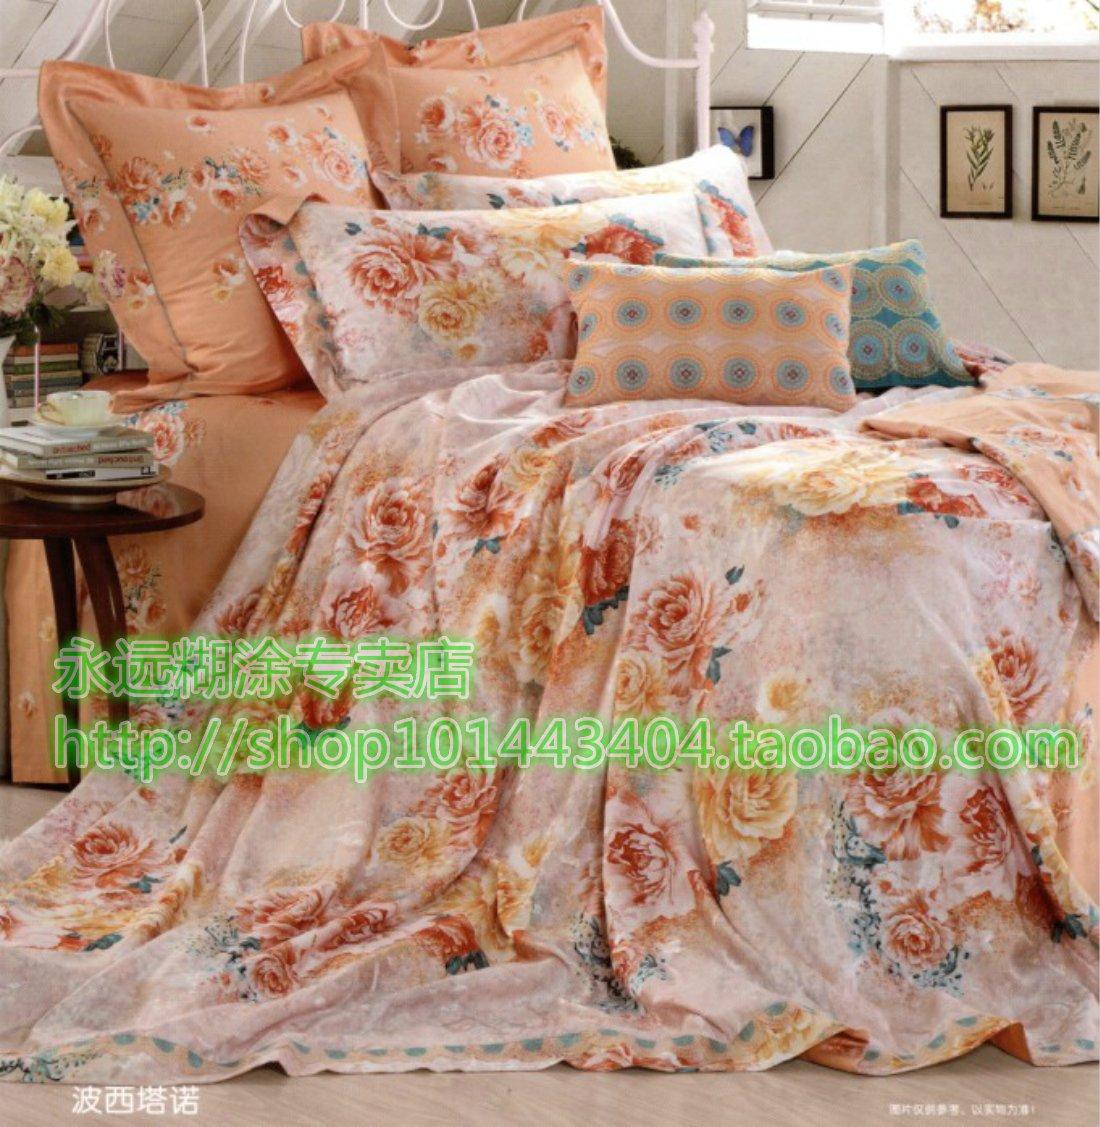 Four sets of Positano mercury textile Tencel item AY1469106650106652